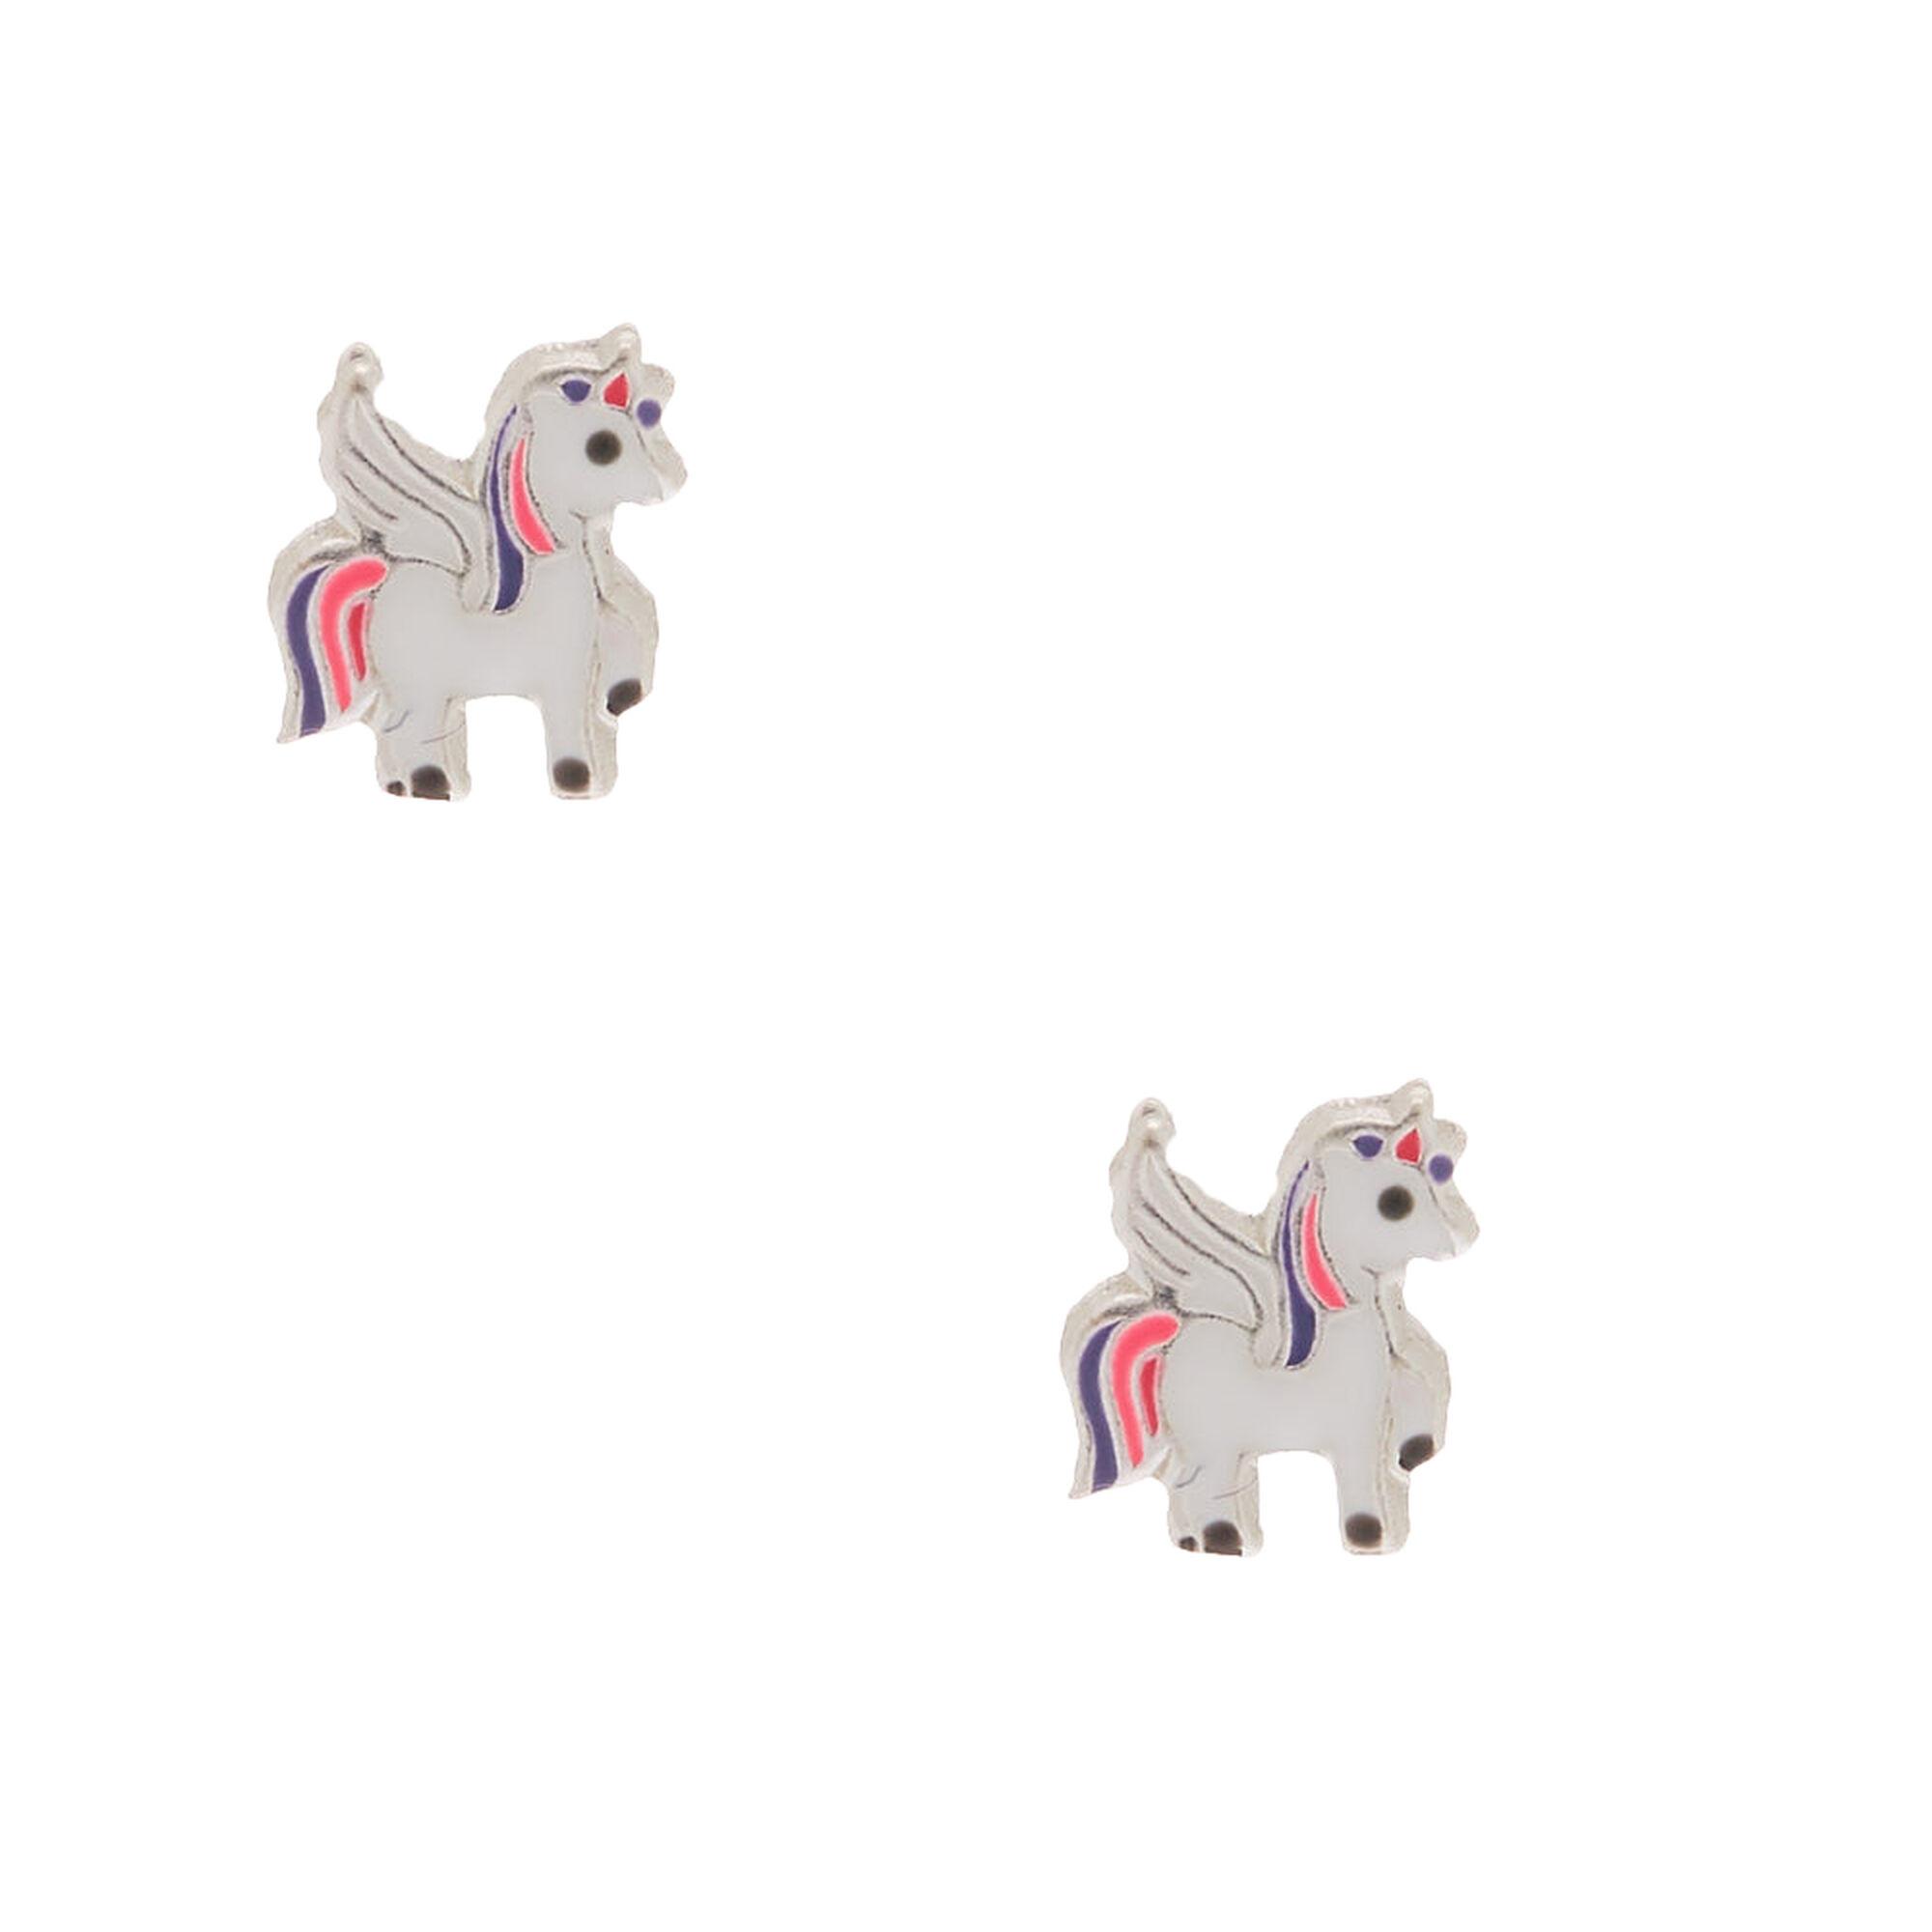 cd46ef6f4 Sterling Silver Pegasus Stud Earrings | Claire's